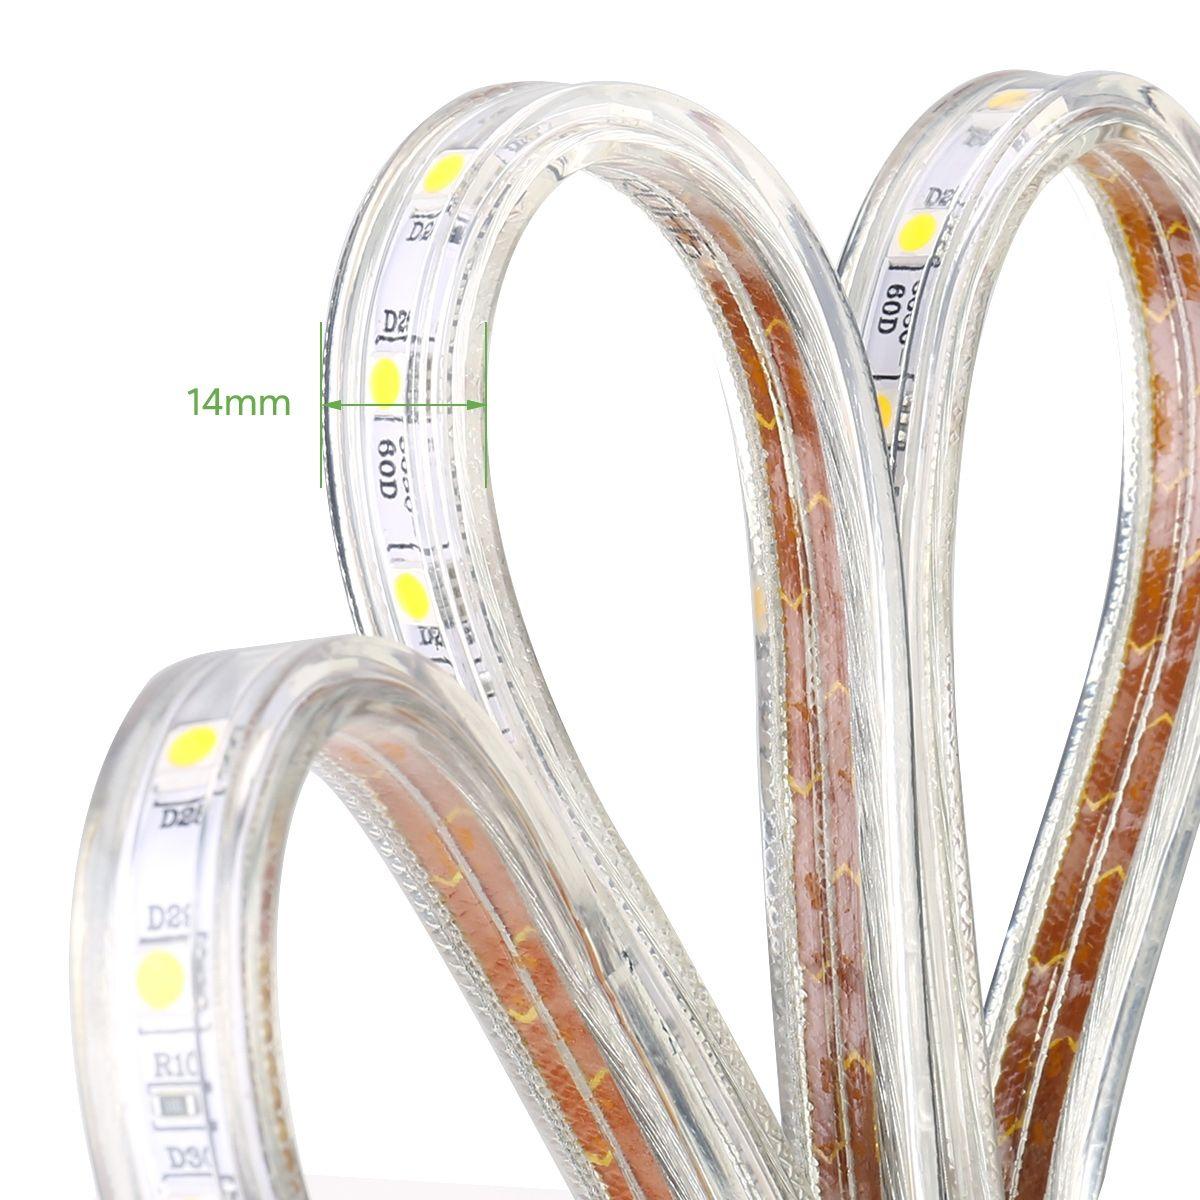 Le 49ft Led Strip Lights 120 Volt 115w 900 Smd 5050 Leds Waterproof Flexible Daylight White Etl Listed Indoor Outdoor Led Rope Lights Strip Lighting Led Curtain Lights